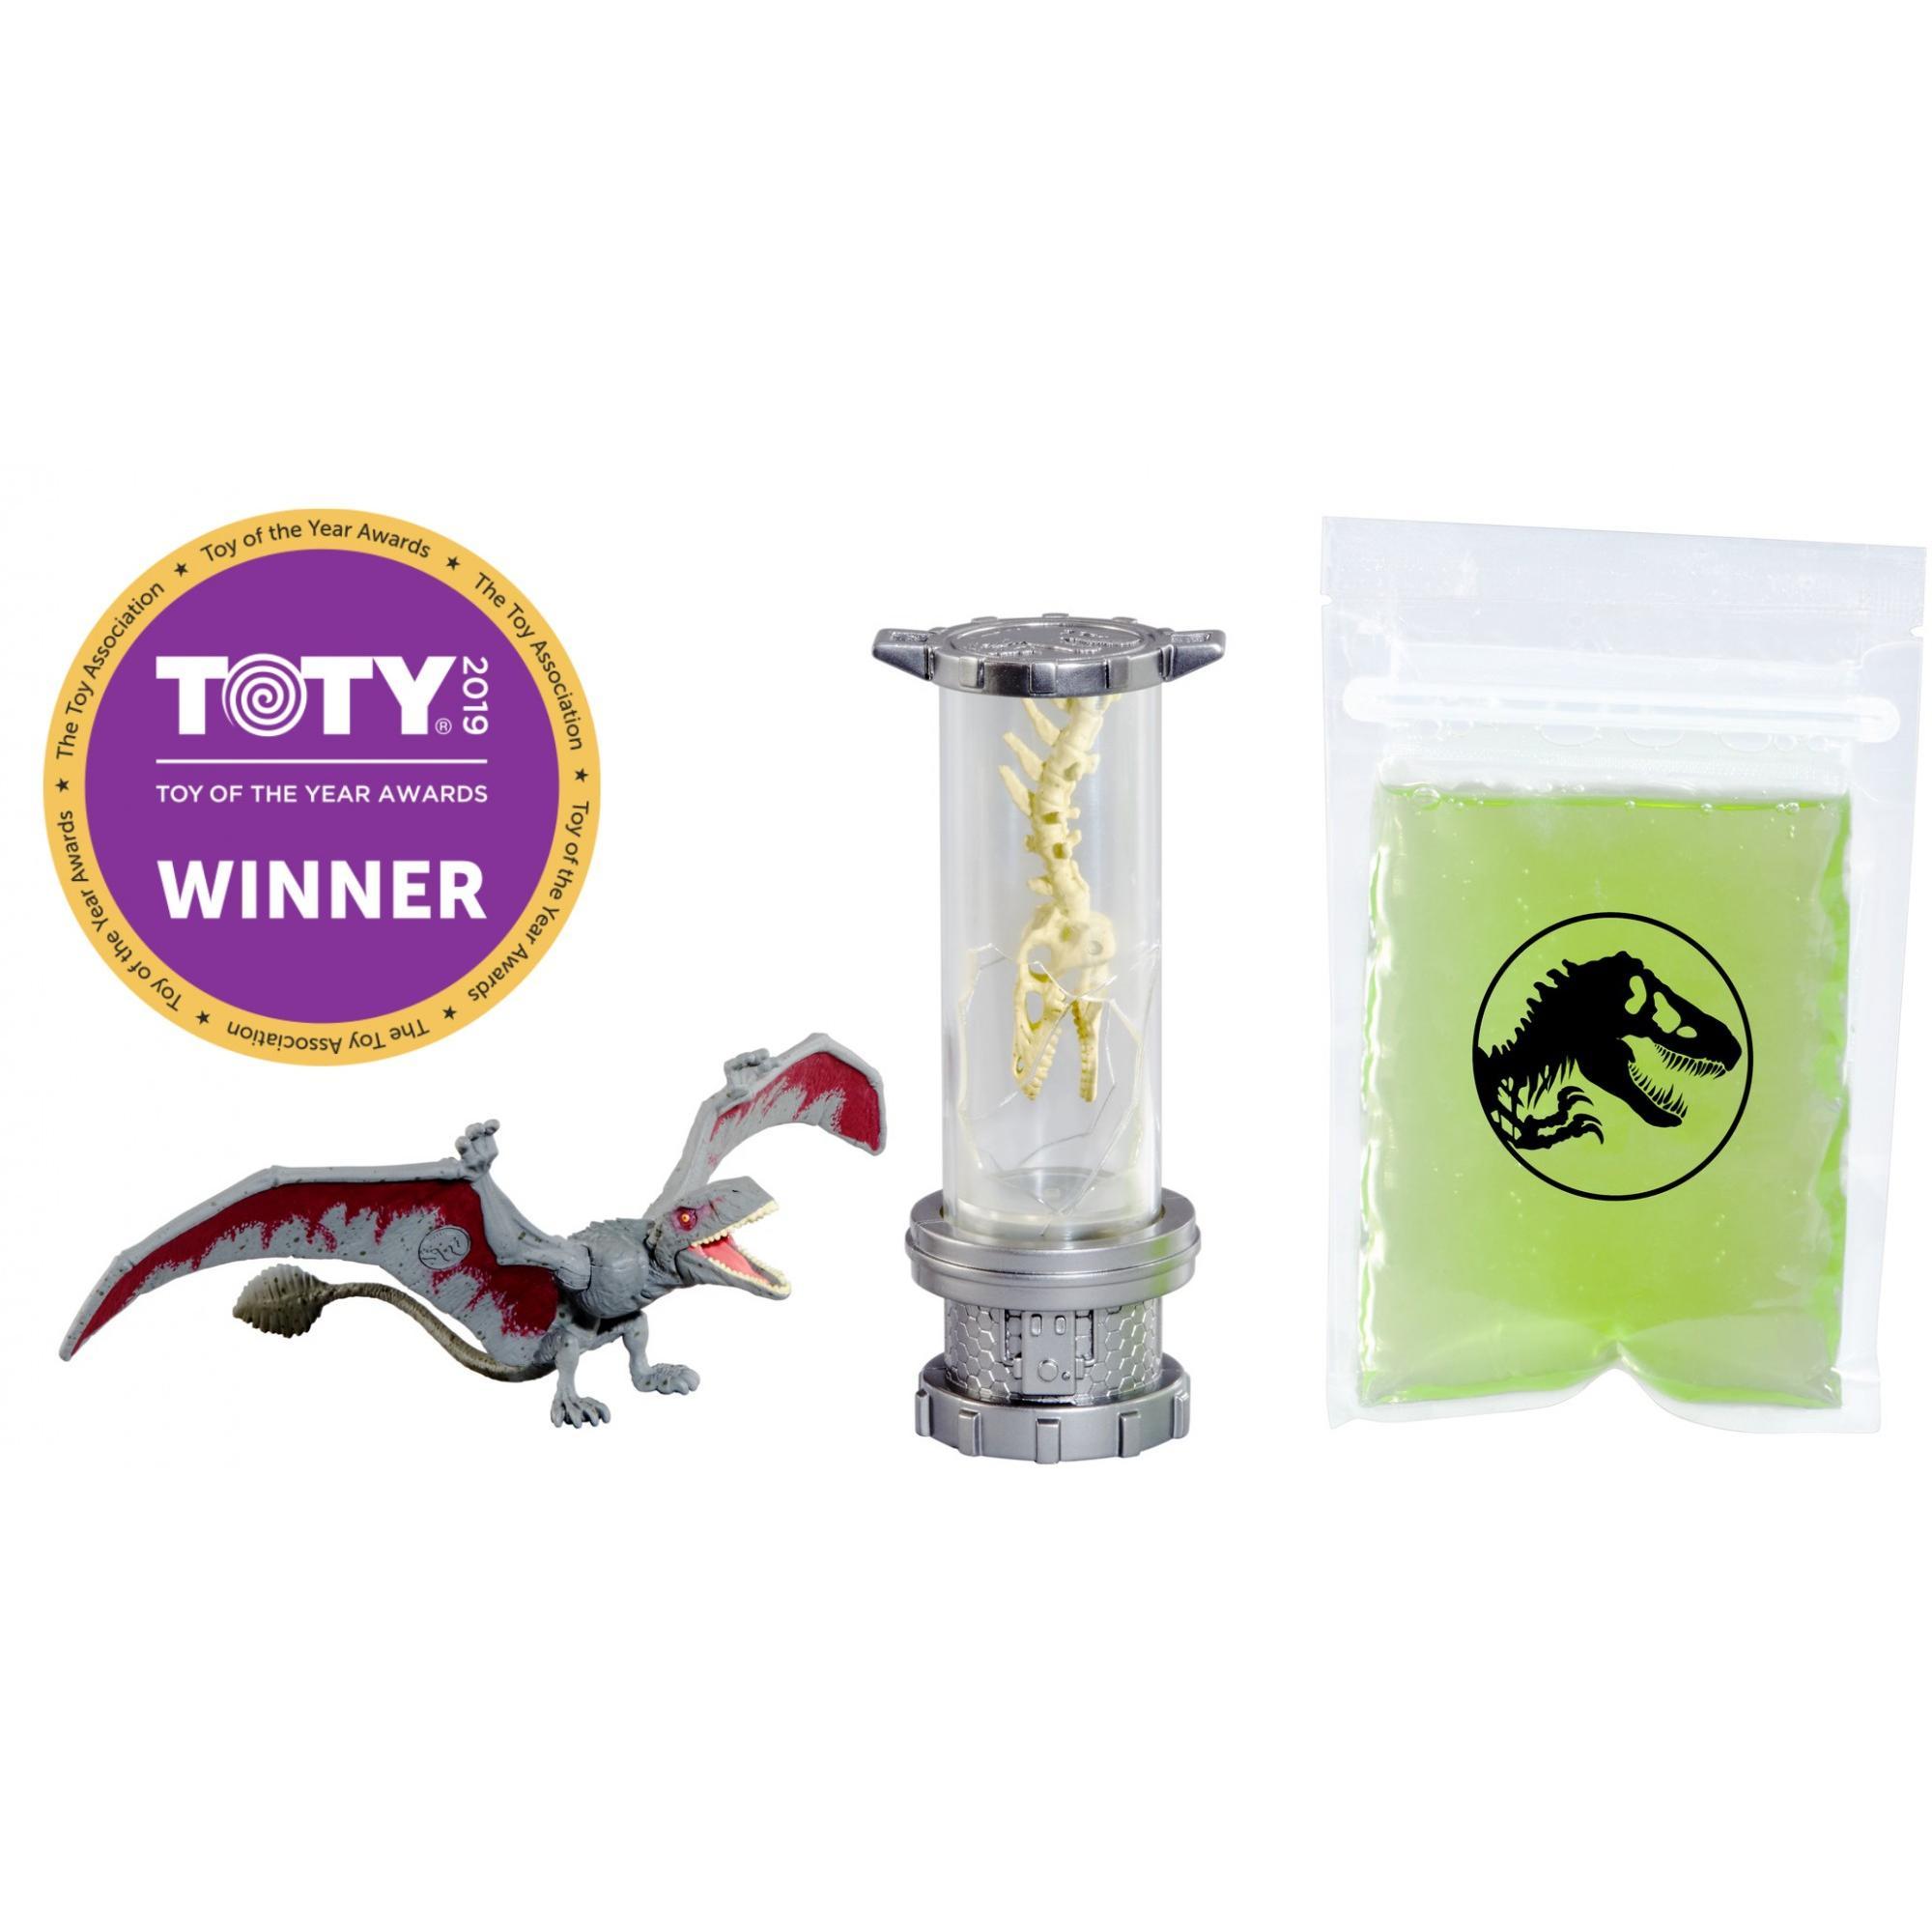 Jurassic World Slime Dino DNA Lab Kit with Dimorphodon Dinosaur